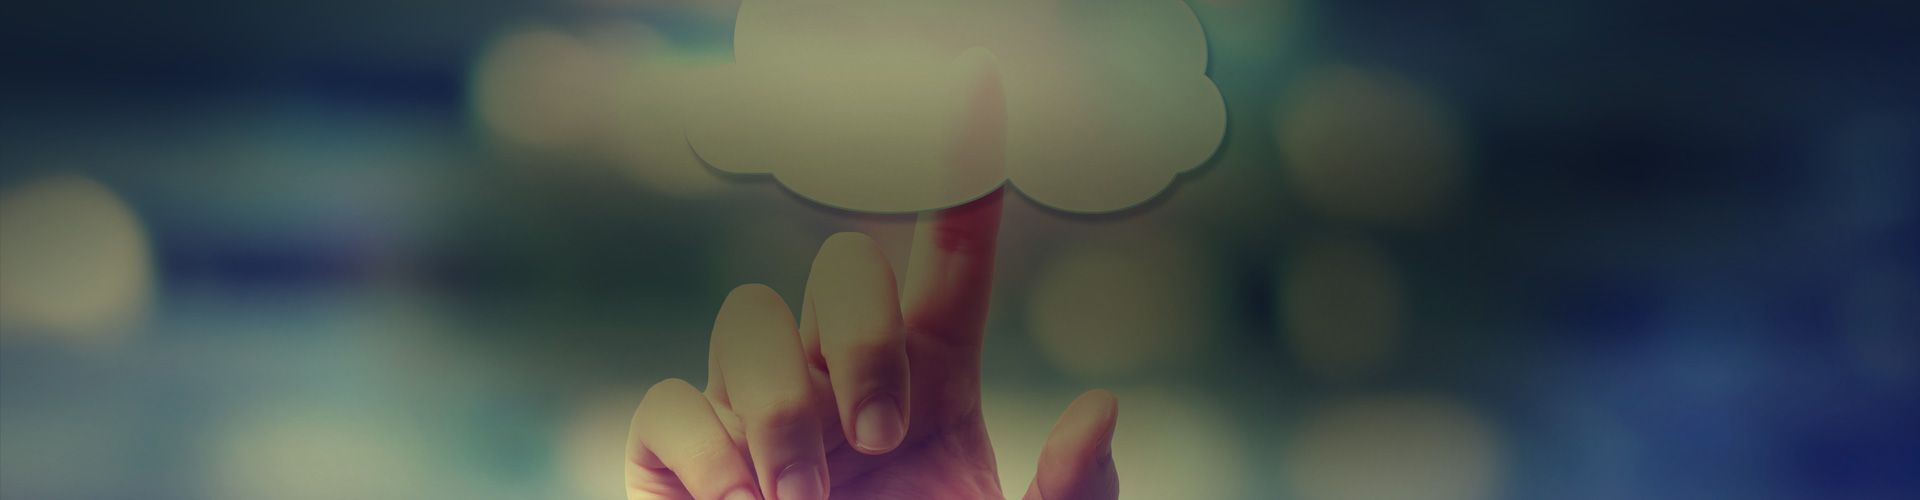 bg-slider-cloud